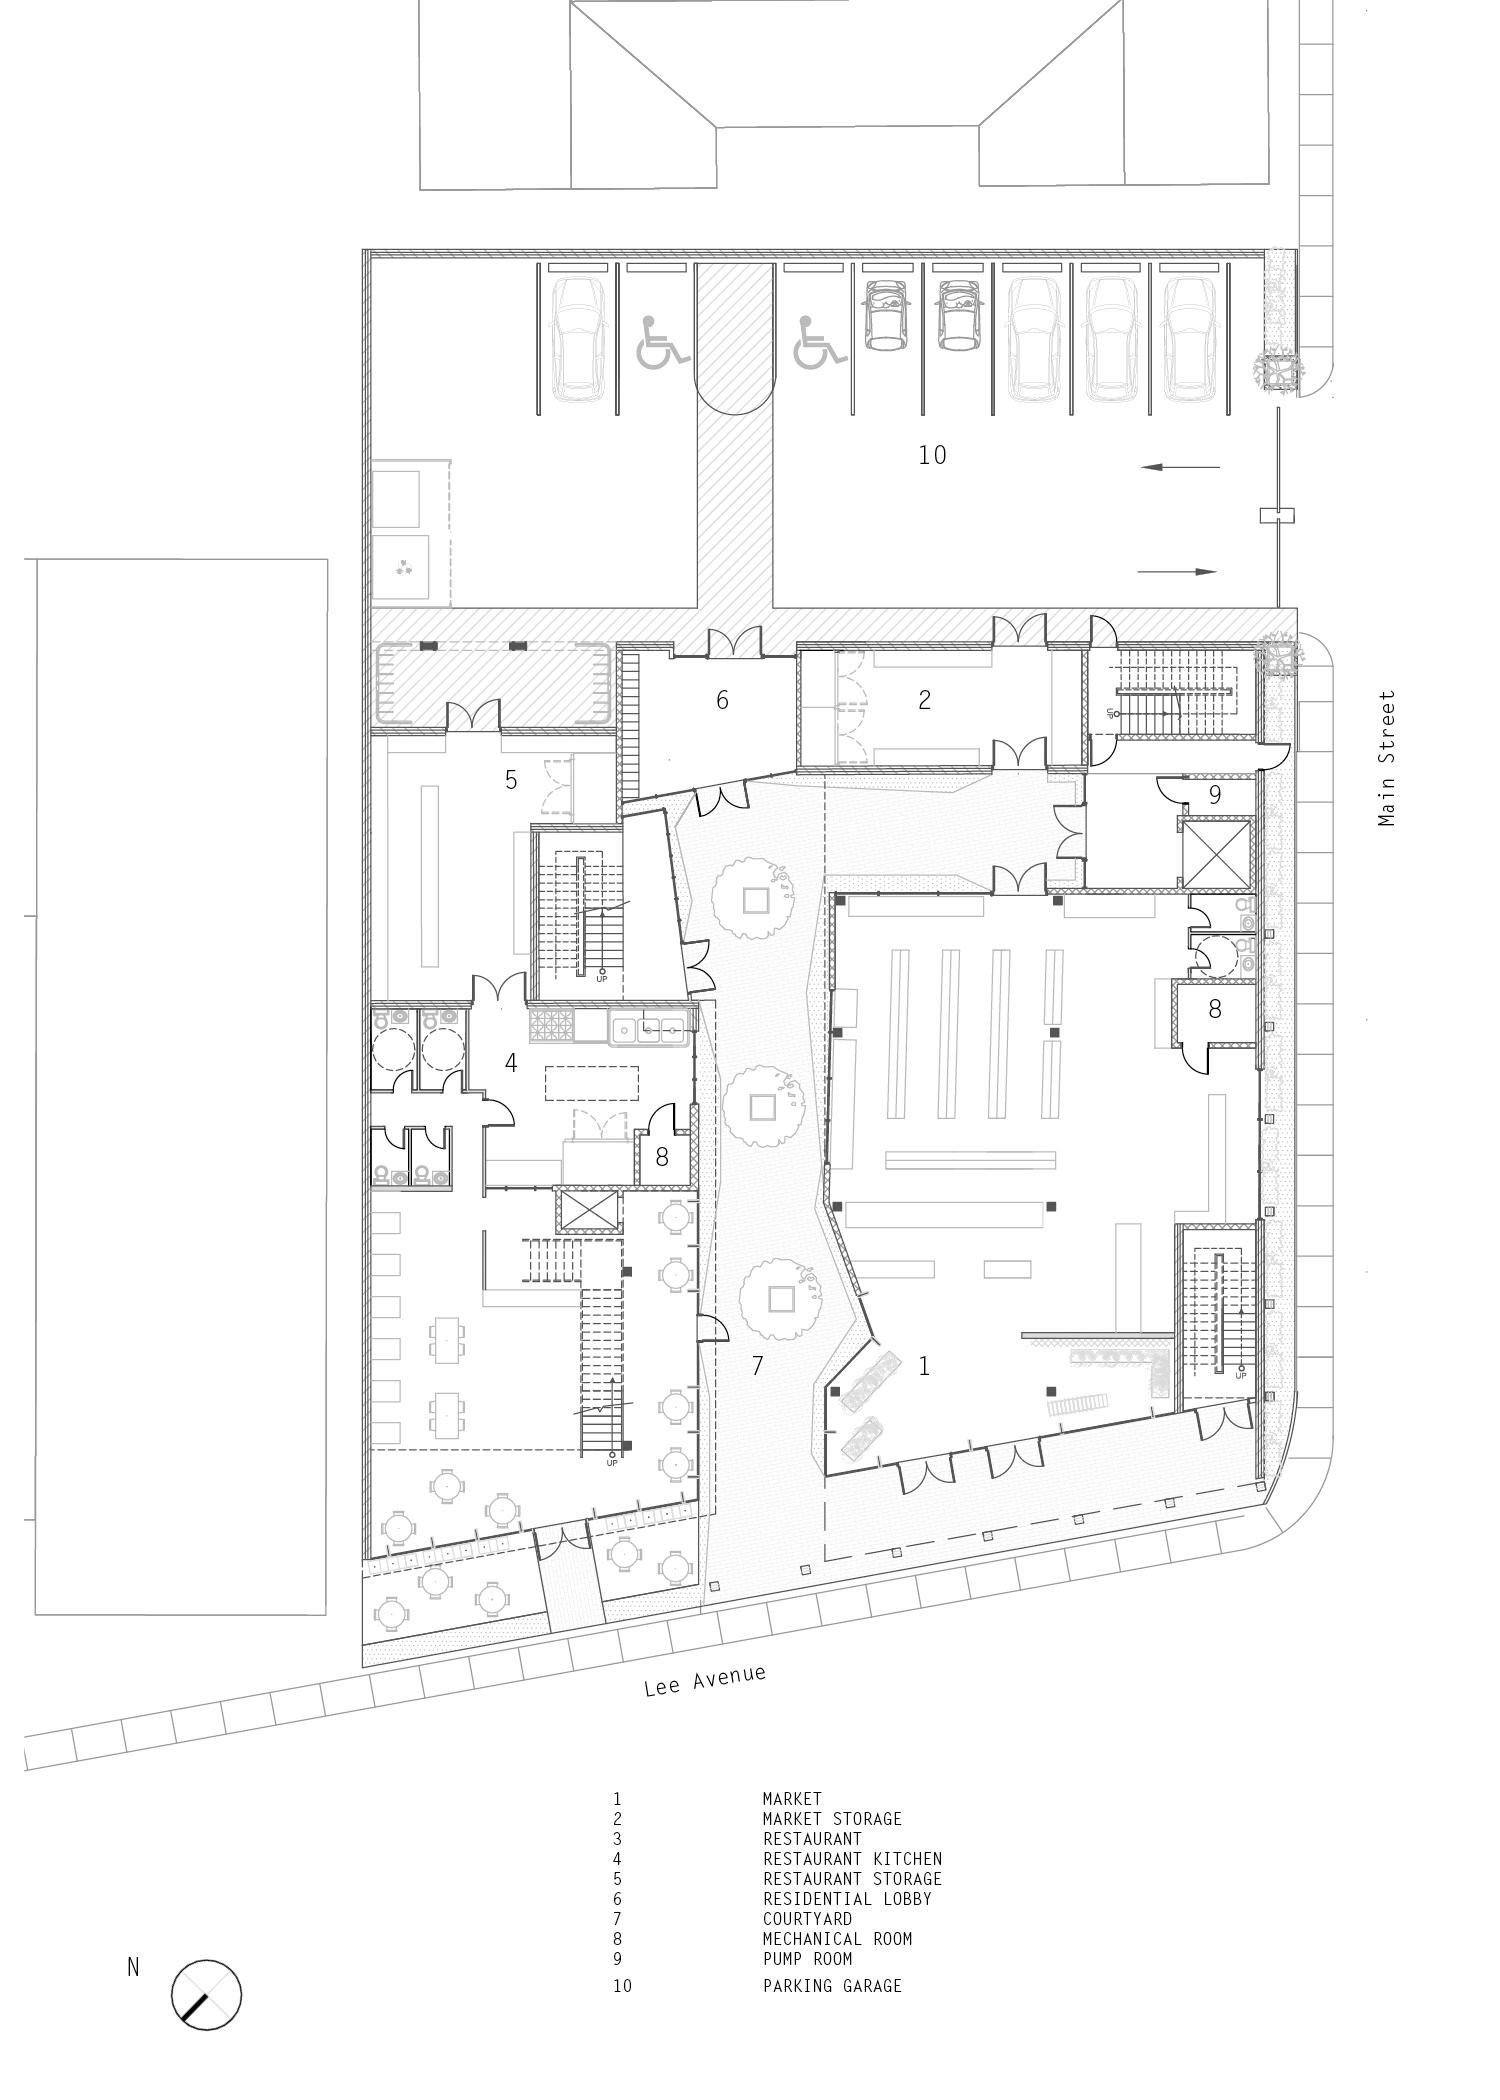 Indiv. Floor Plans.jpg